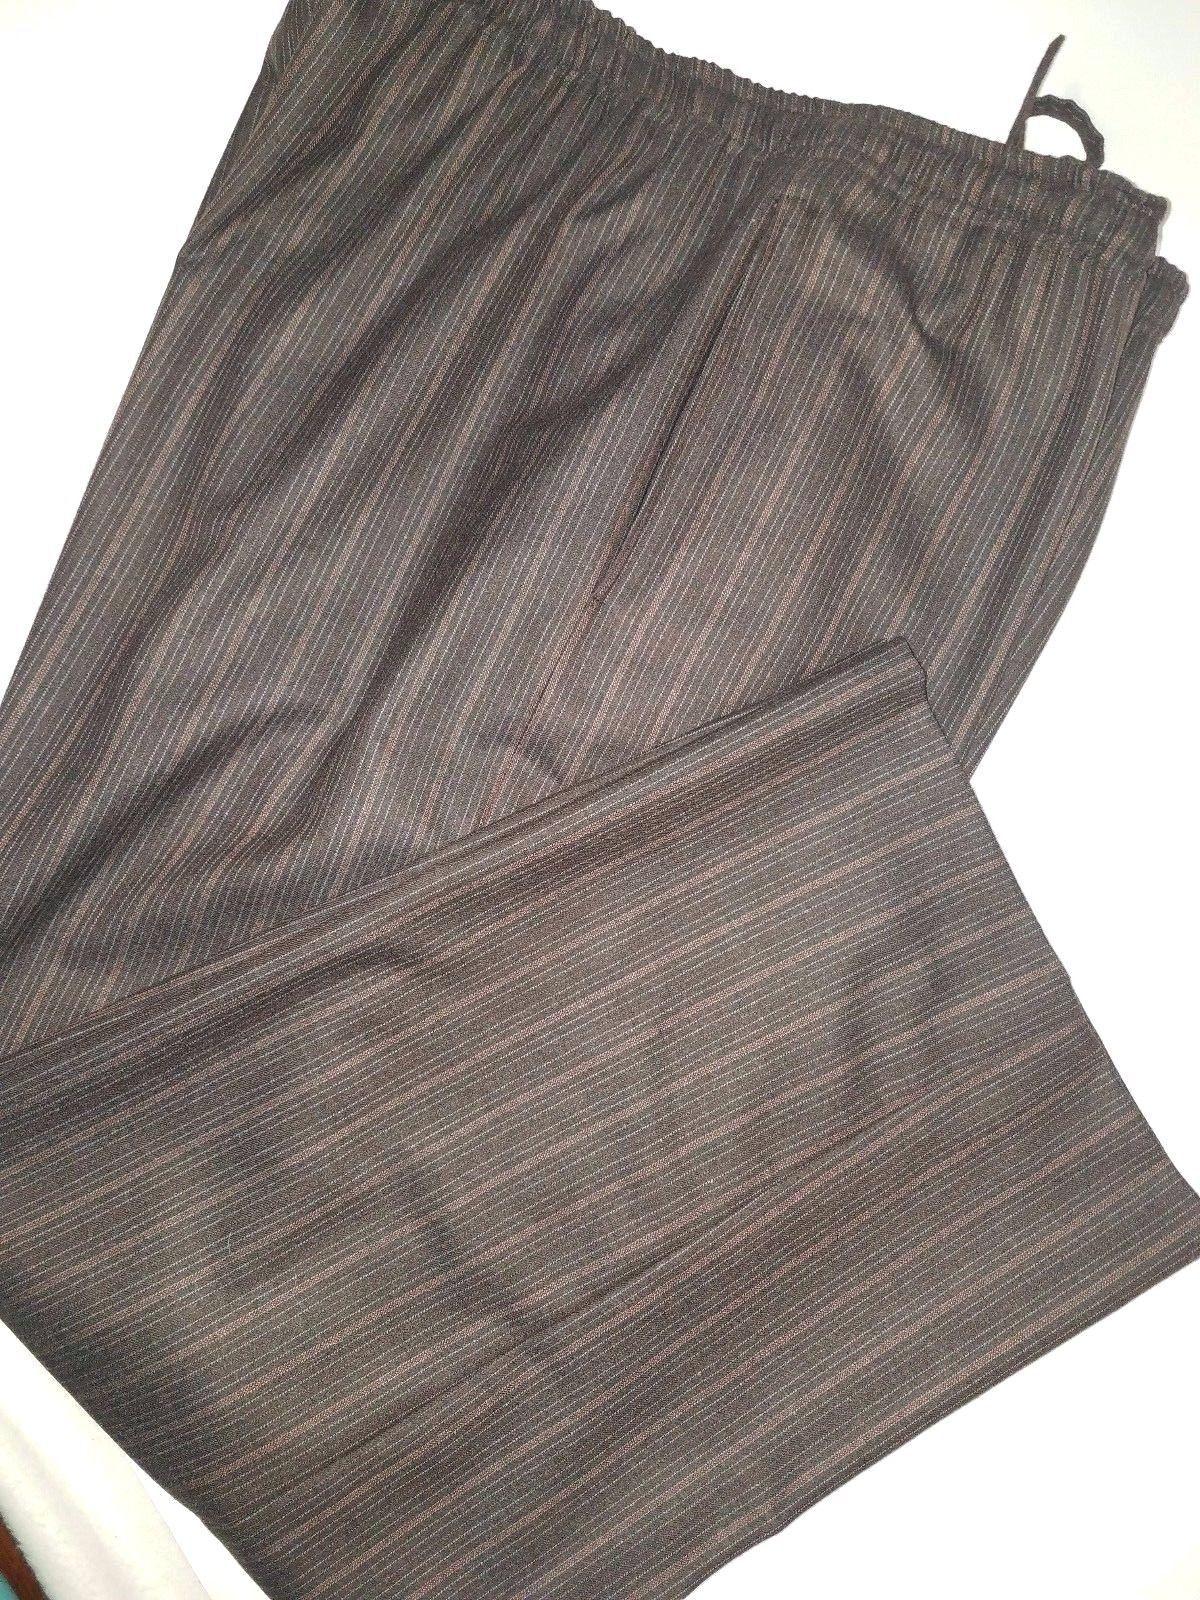 ESKANDAR 2 Neiman Marcus Pants 100%Wool Striped Relaxed Elastic Waist Drawstring